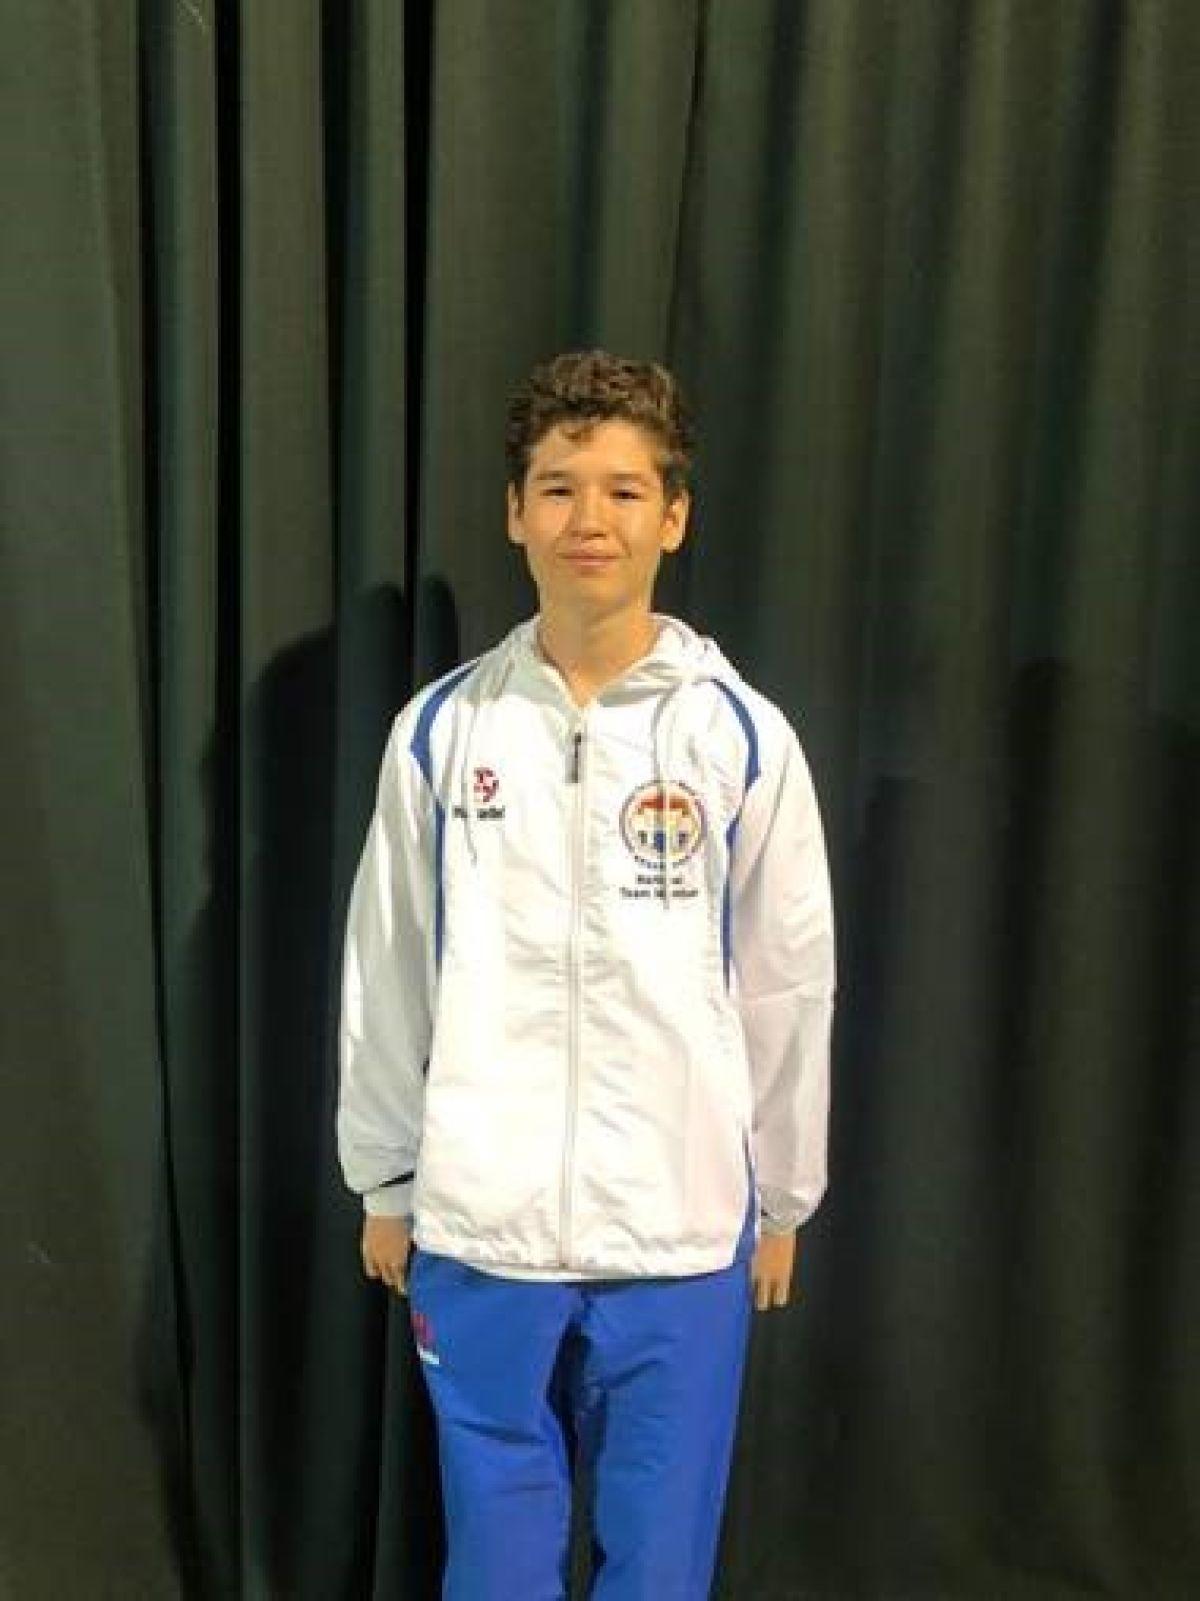 LOOT-leerling Floris Sujecki (15) voert wereldranglijst karate aan